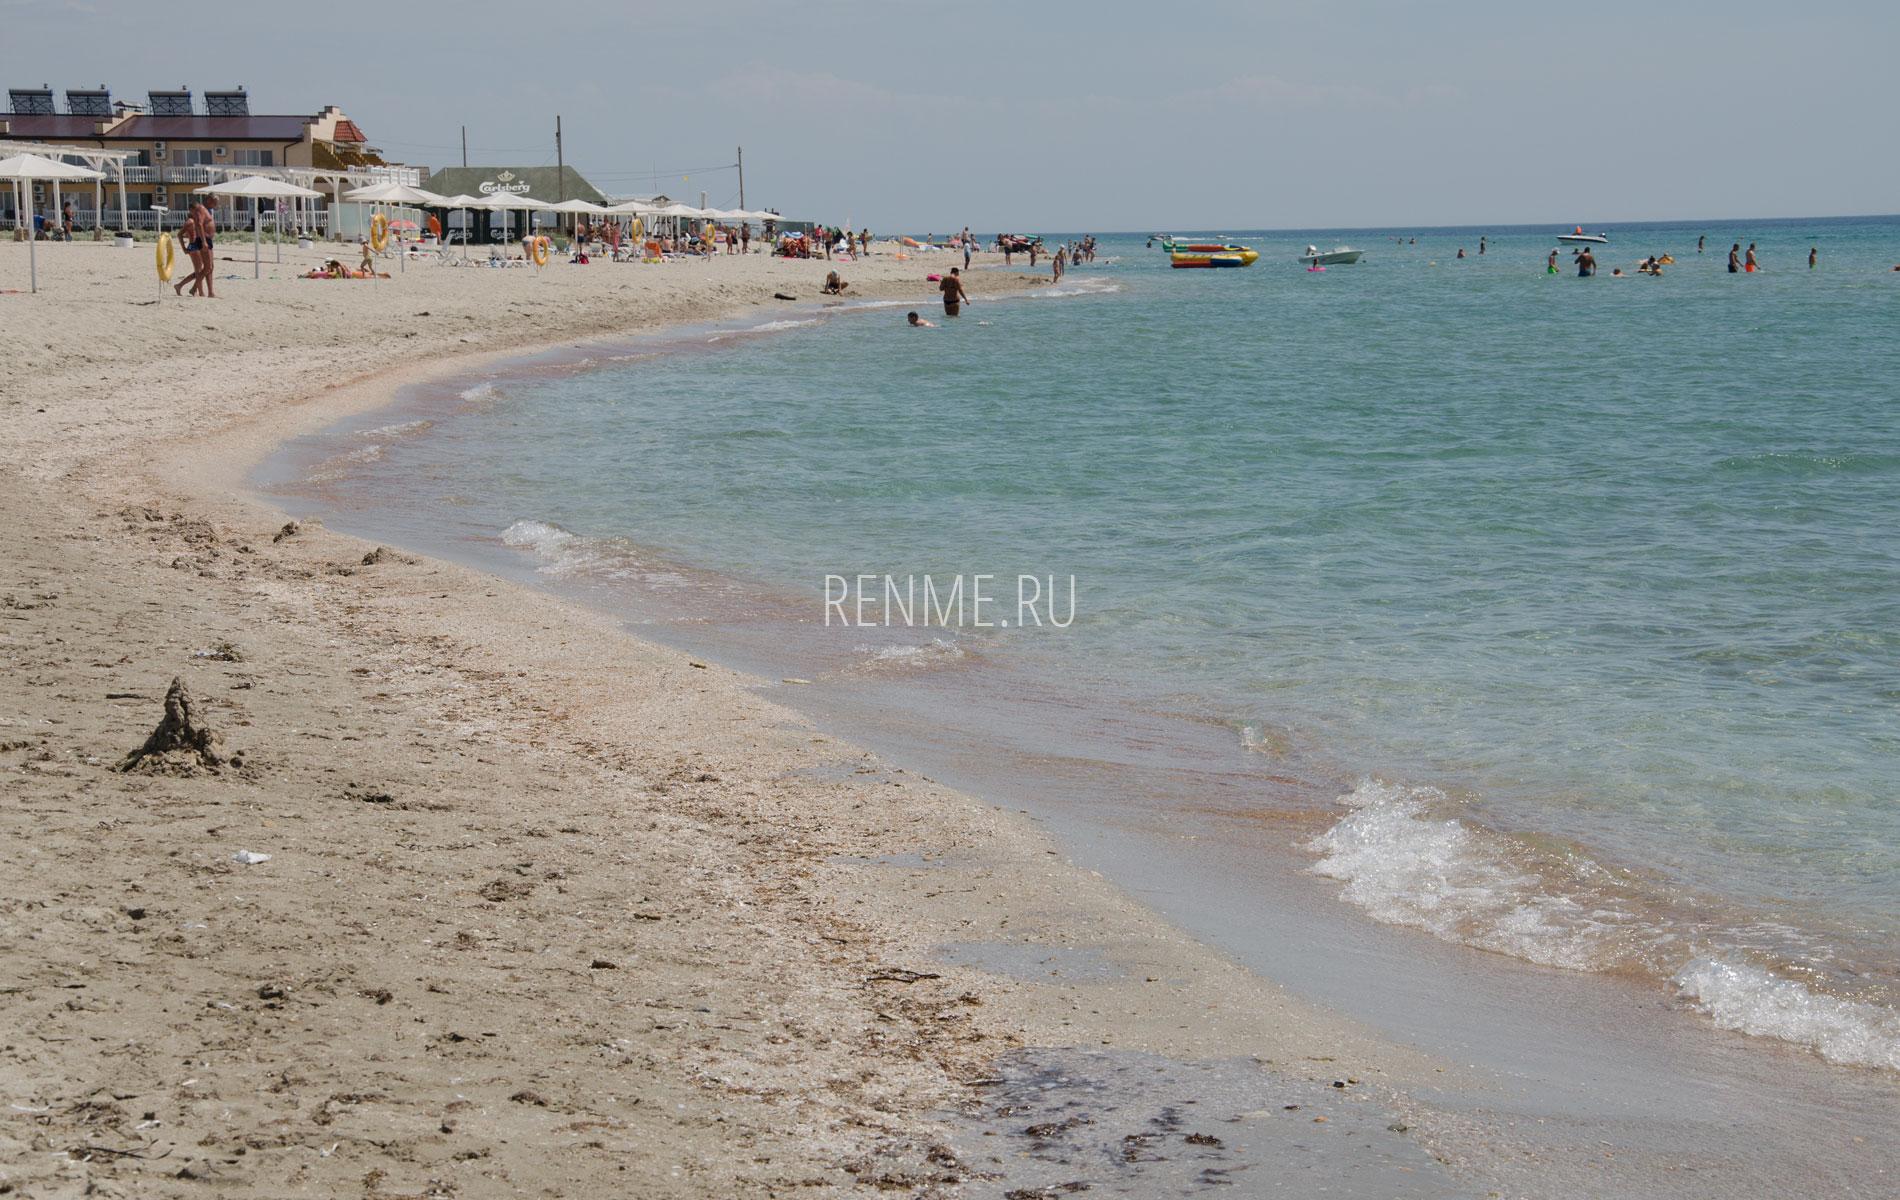 Песчаный берег и море. Фото Штормового